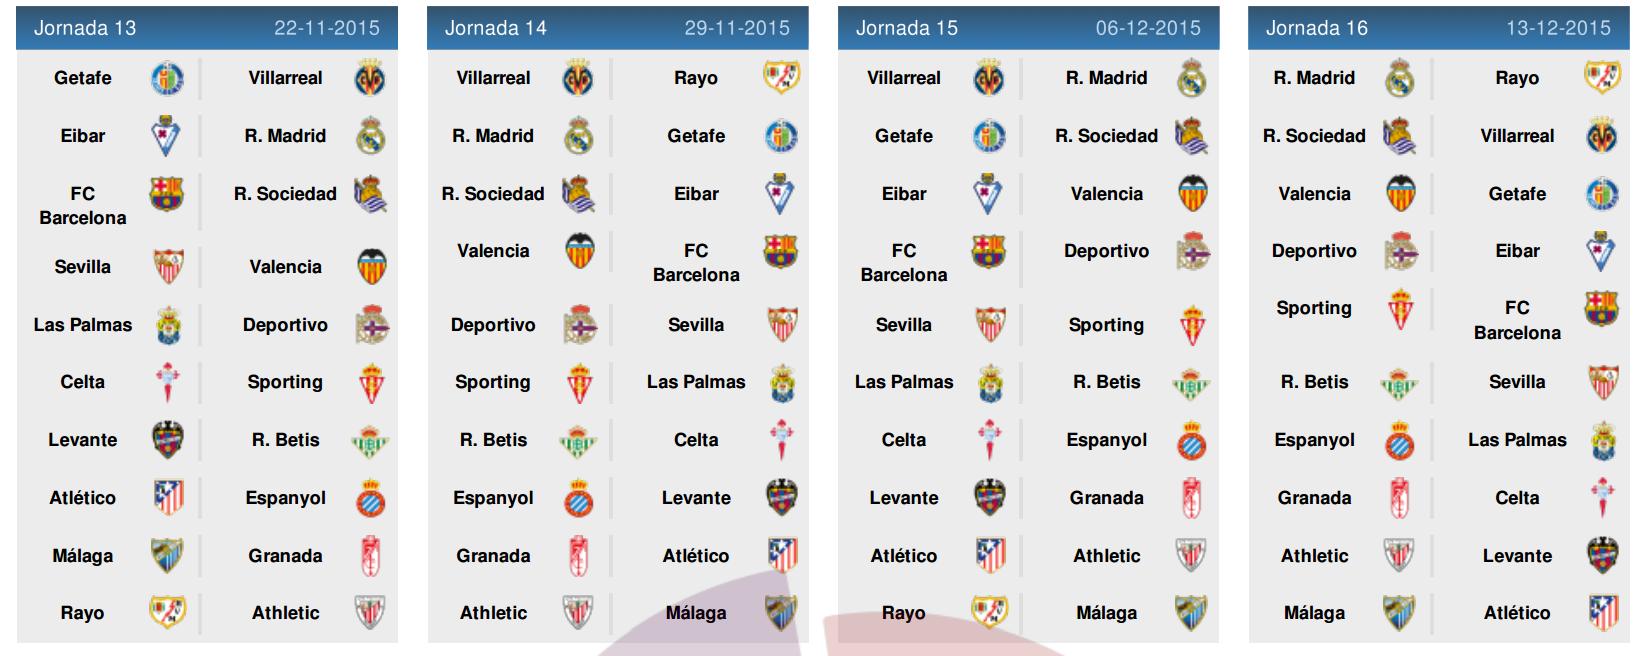 Jadwal Liga Spanyol 2015-2016 4